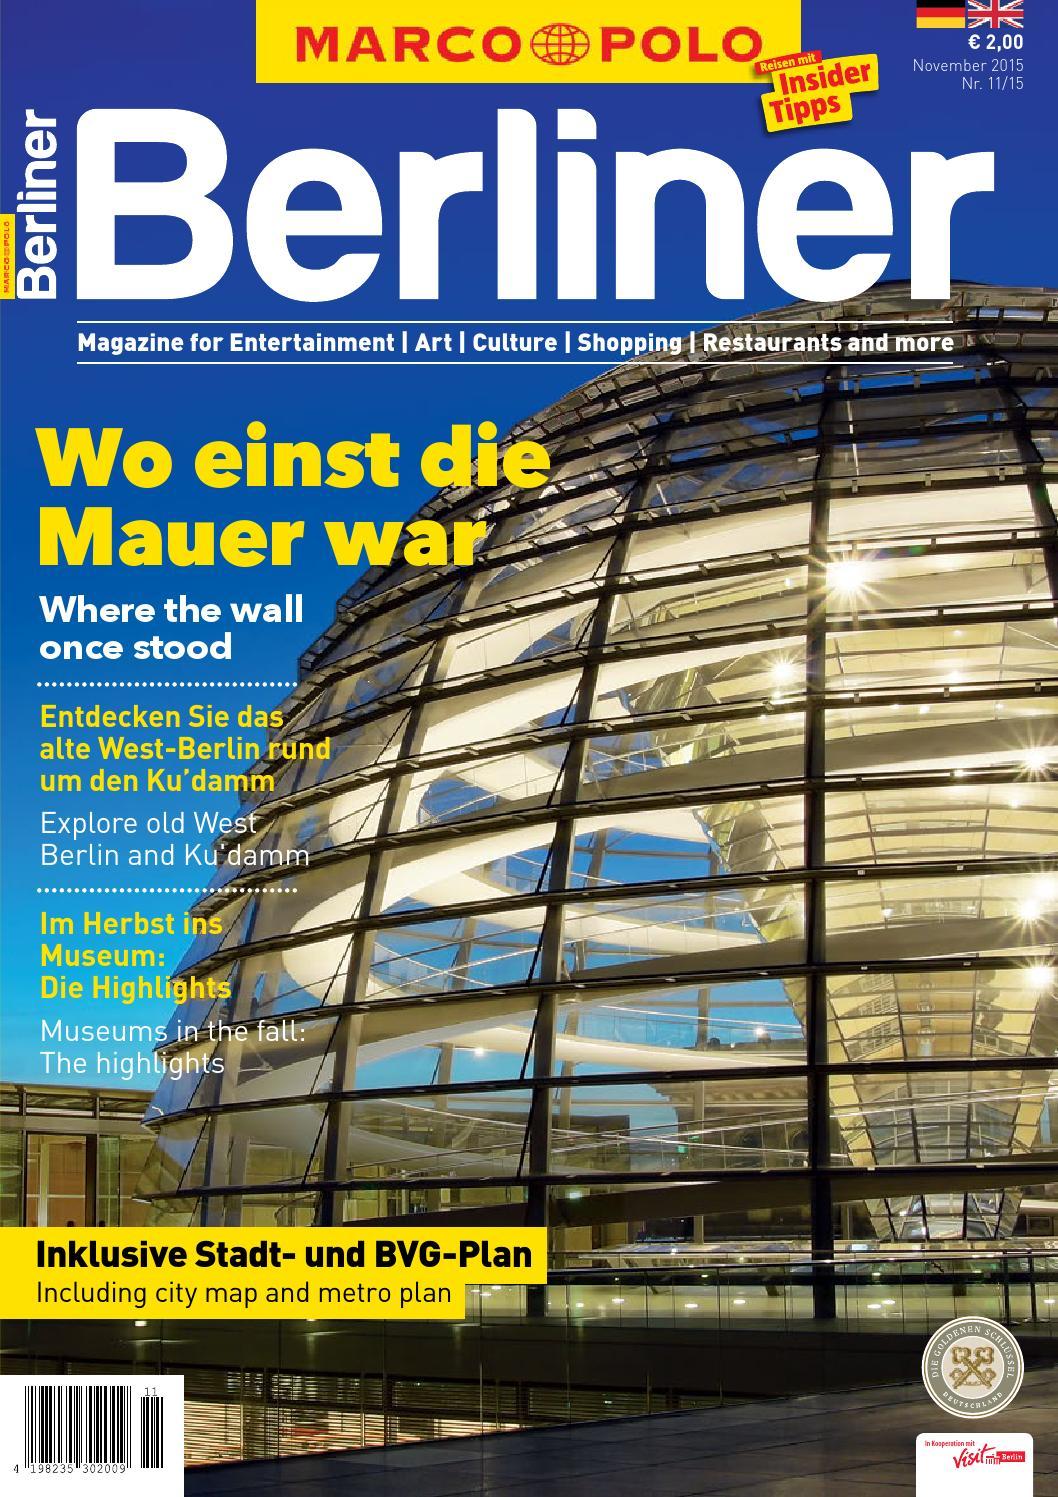 MARCO POLO Berliner 1115 by Berlin Medien GmbH issuu